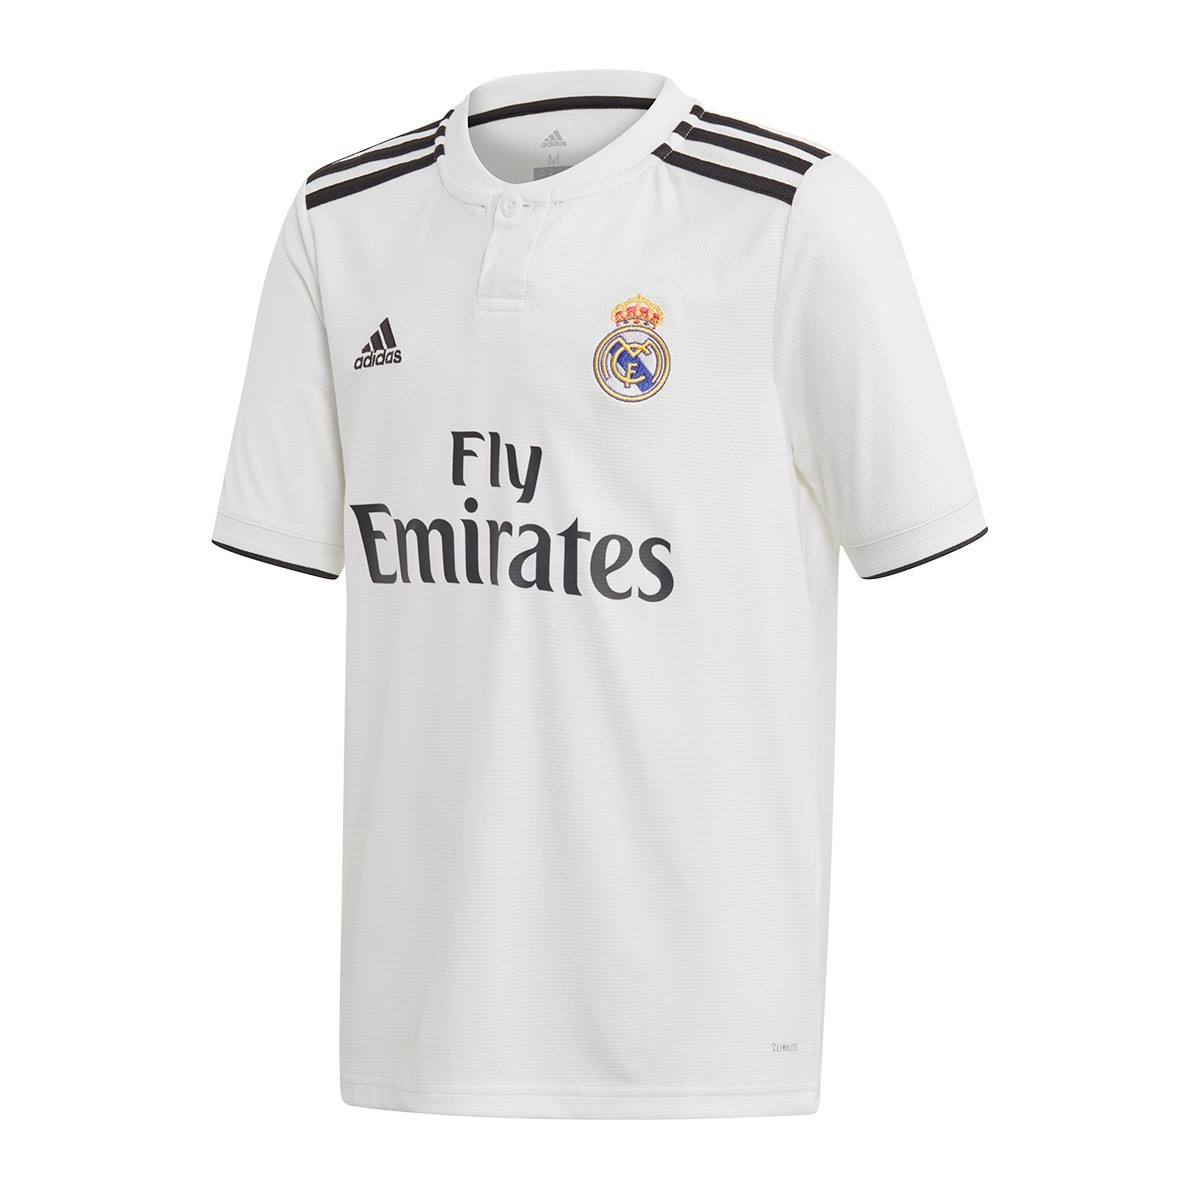 2174e981 adidas Kids Real Madrid LFP 2018-2019 Home Jersey. White-black ...